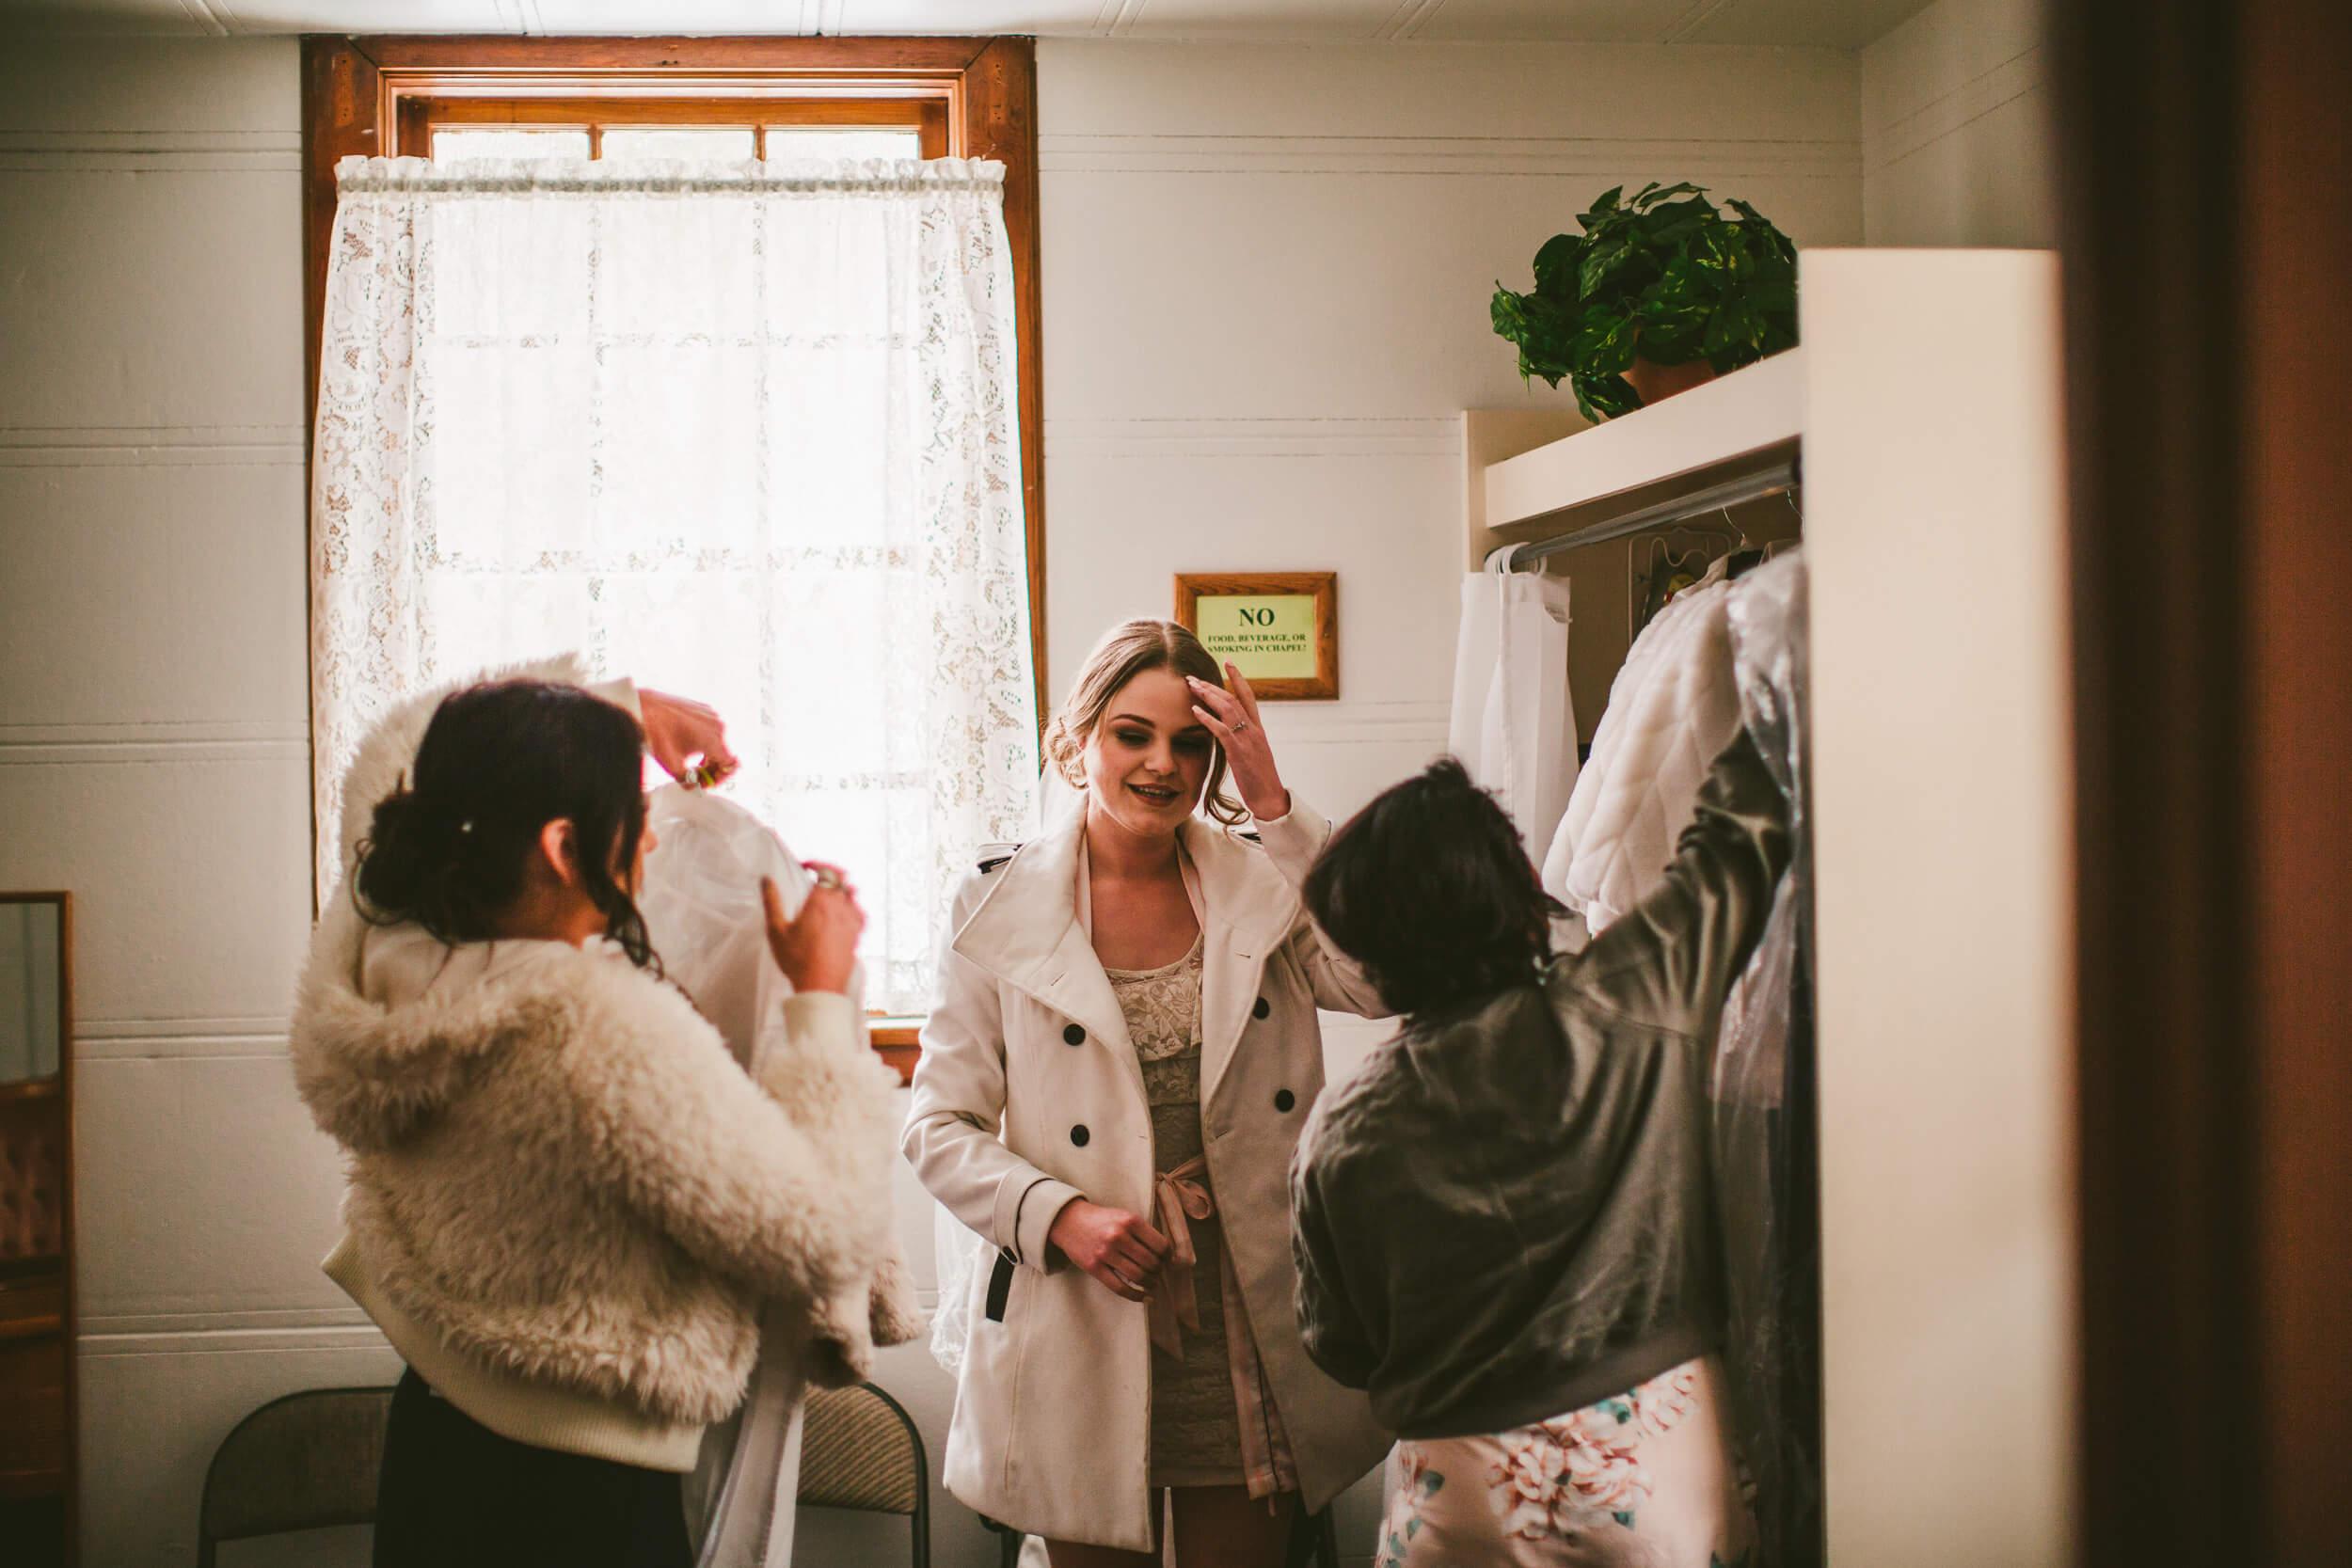 mukogawa winter wedding in spokane (3).jpg